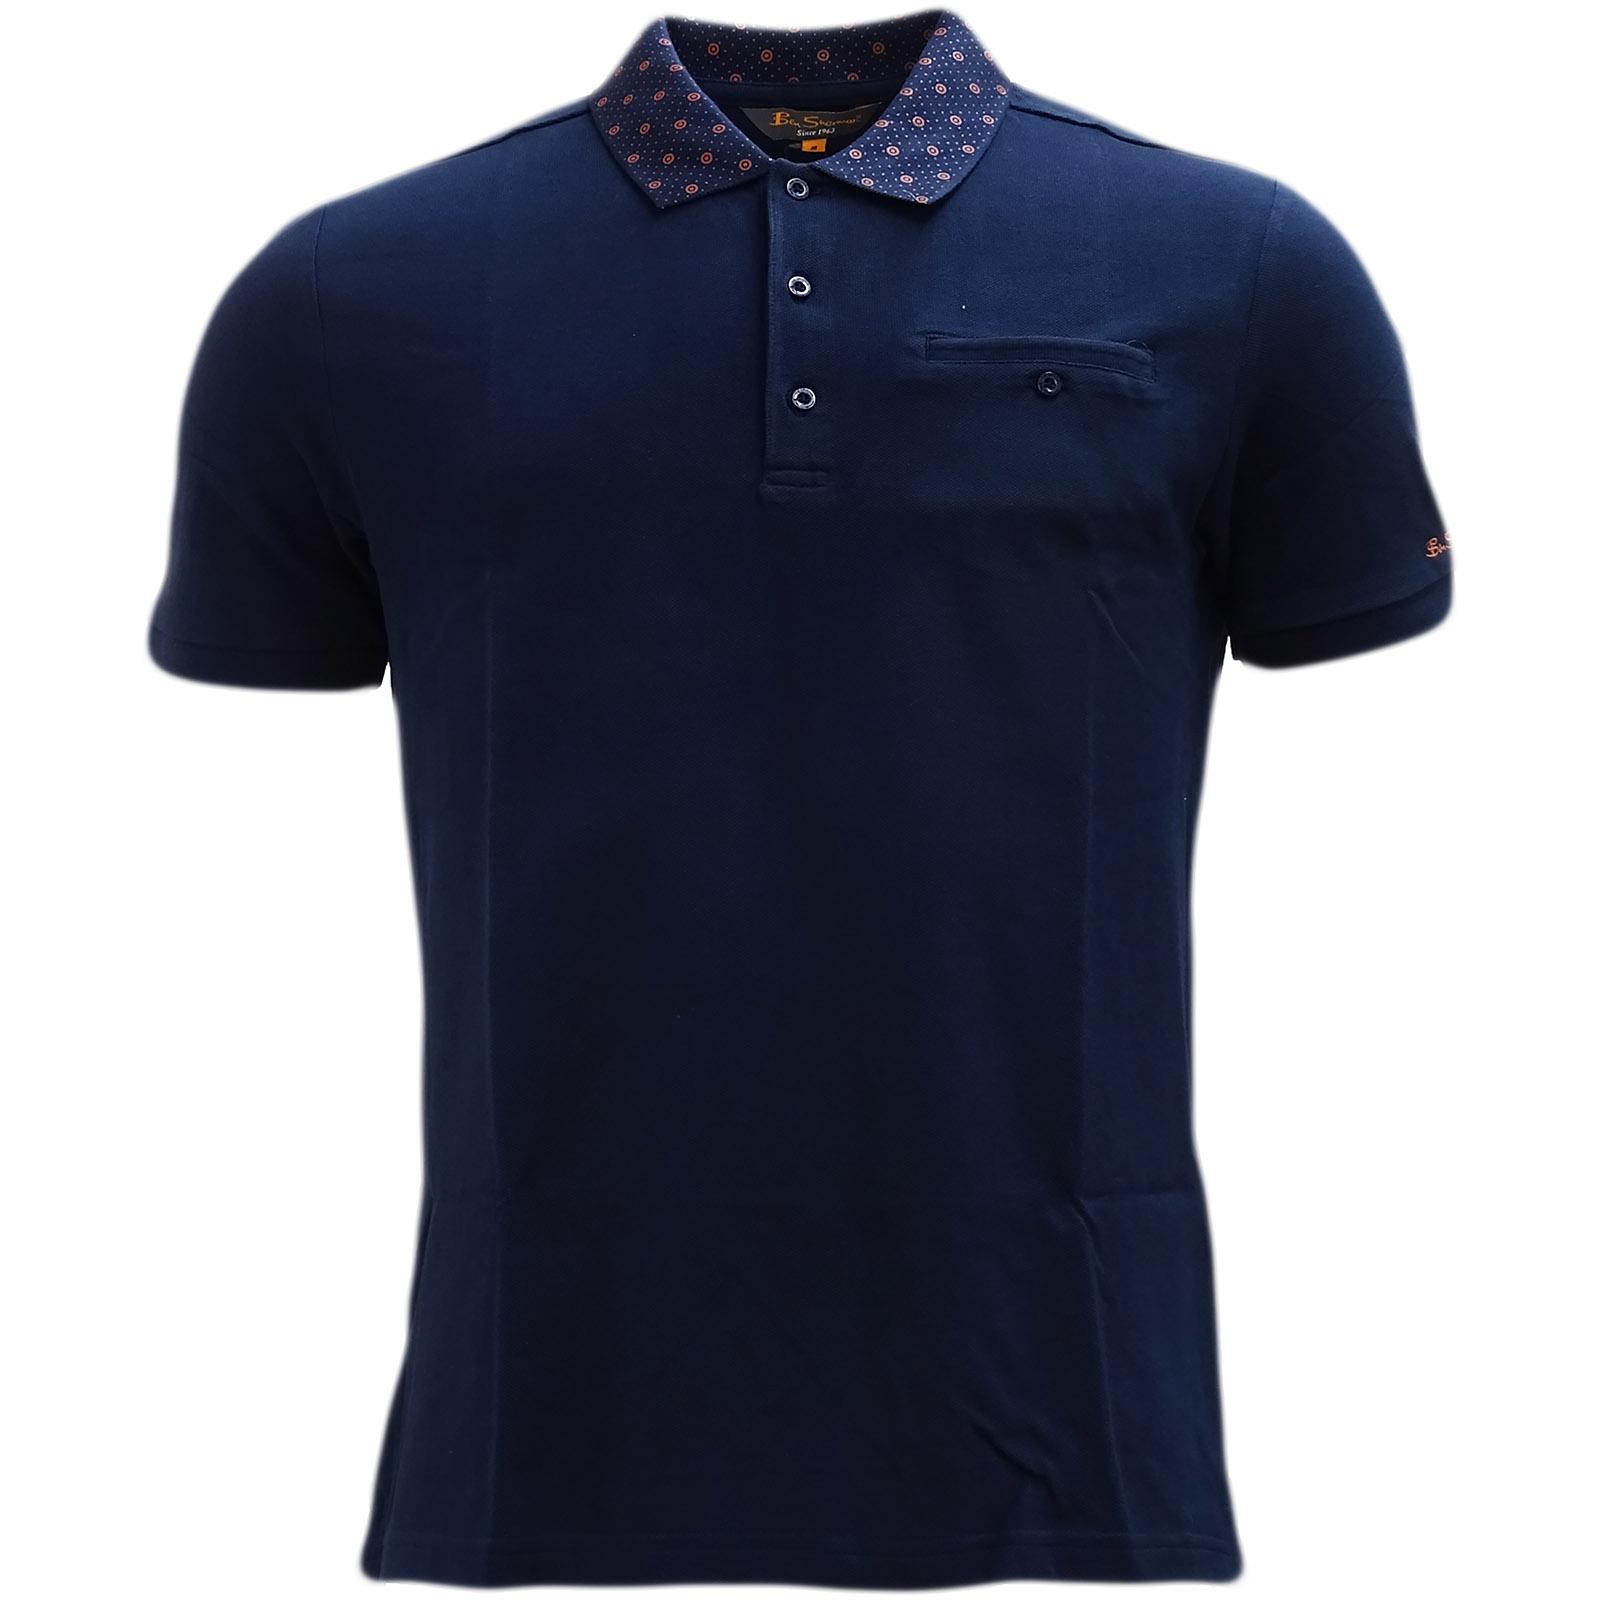 Ben Sherman Navy Target Collar Design Polo Shirt 48282 -